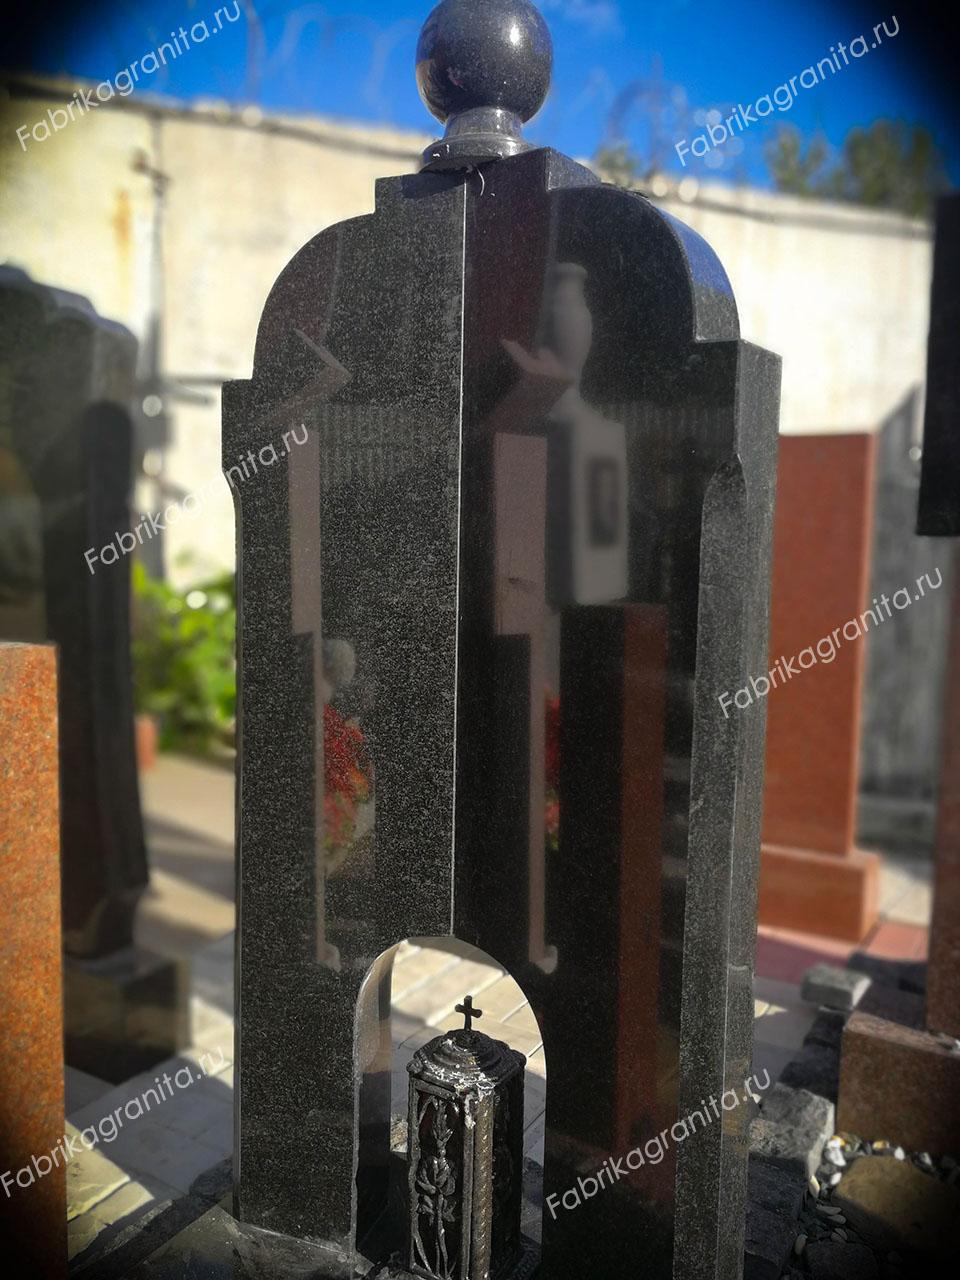 купить бетон памятники якутске